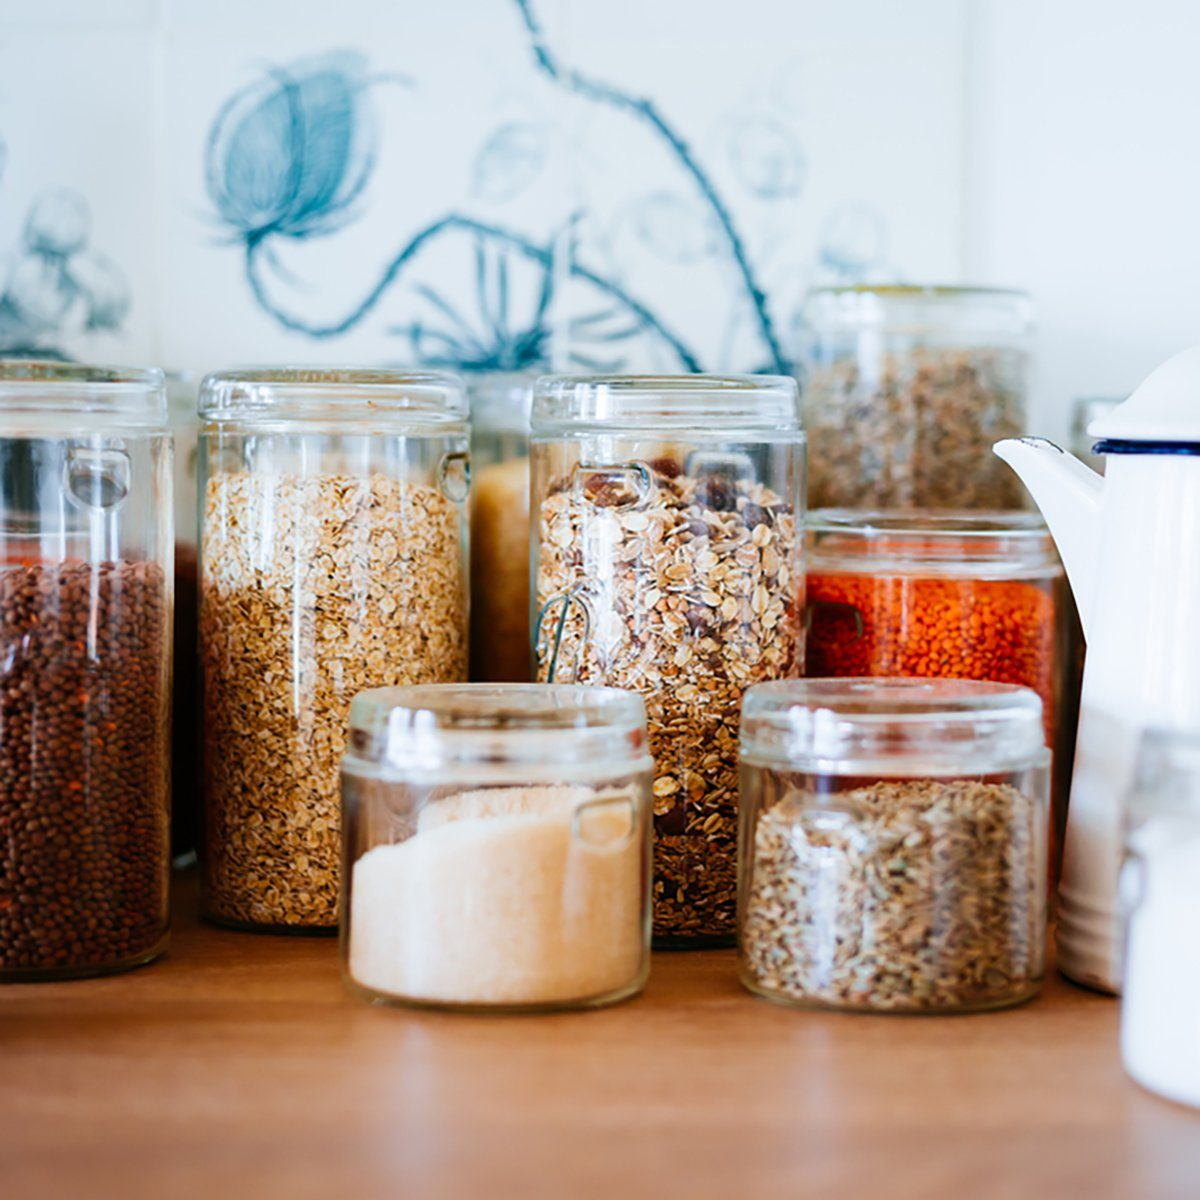 Jar of cereals in kitchen cupboard